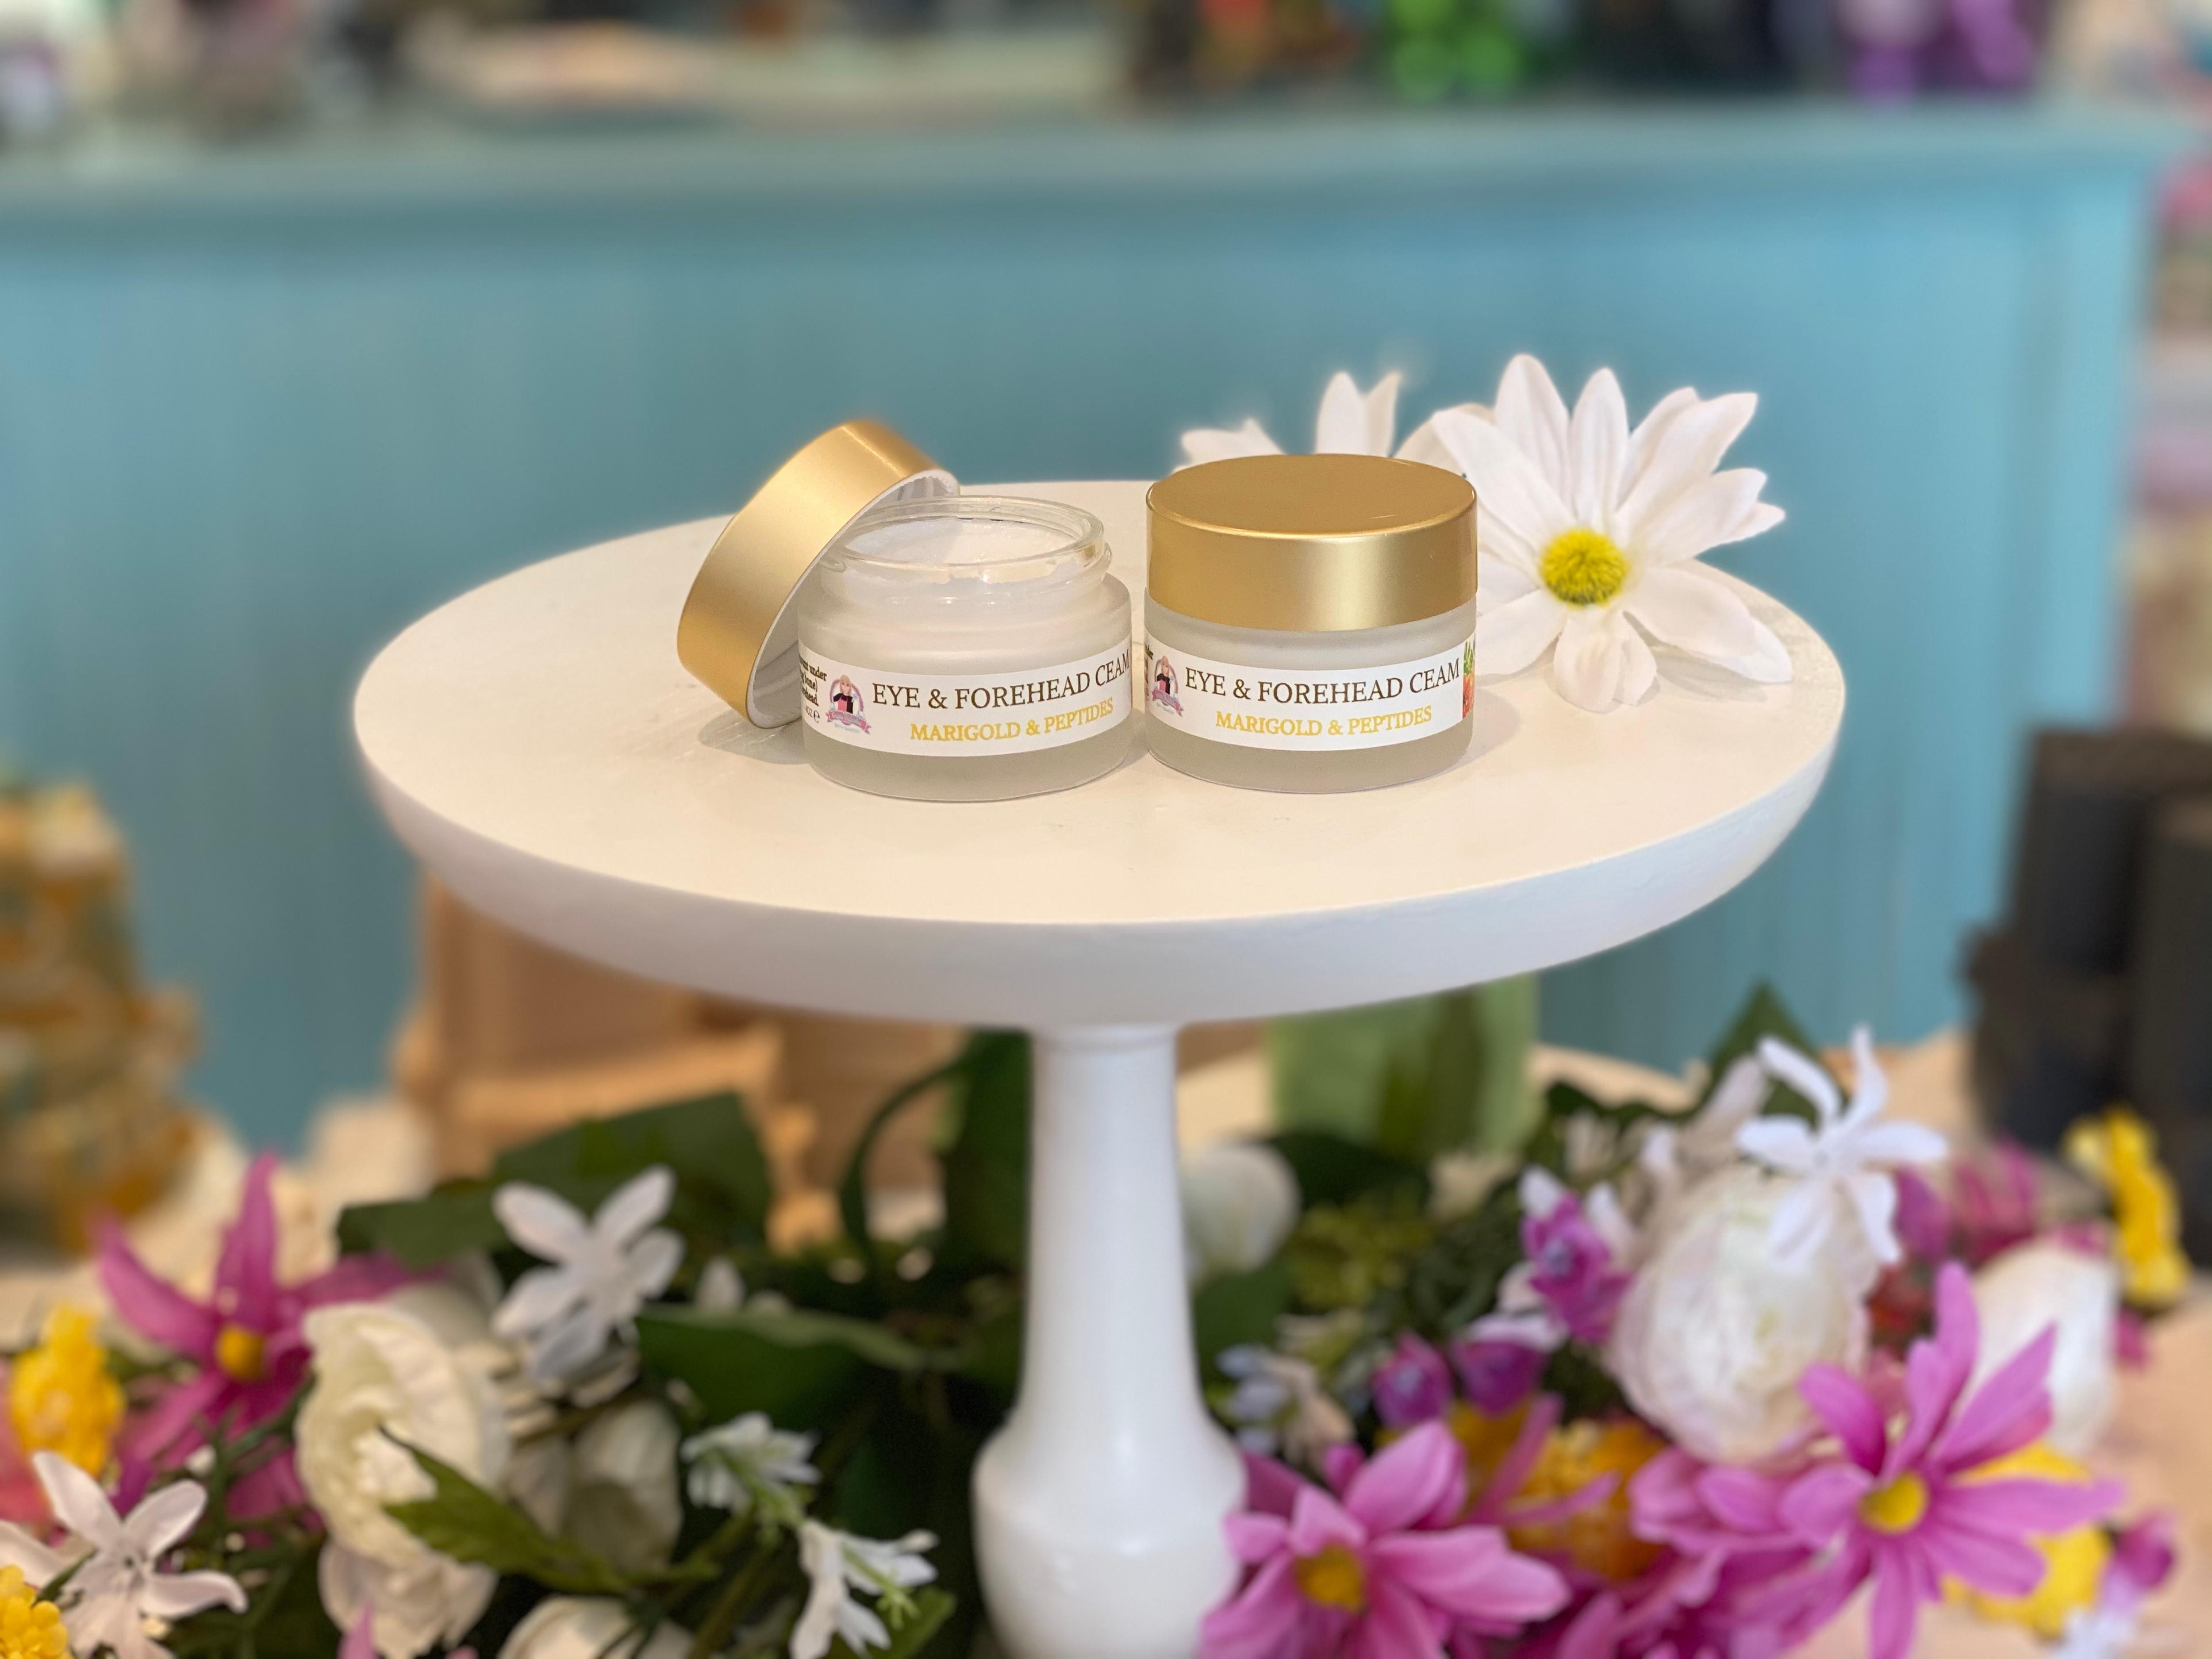 Marigold & Peptides Eye & Forehead Cream